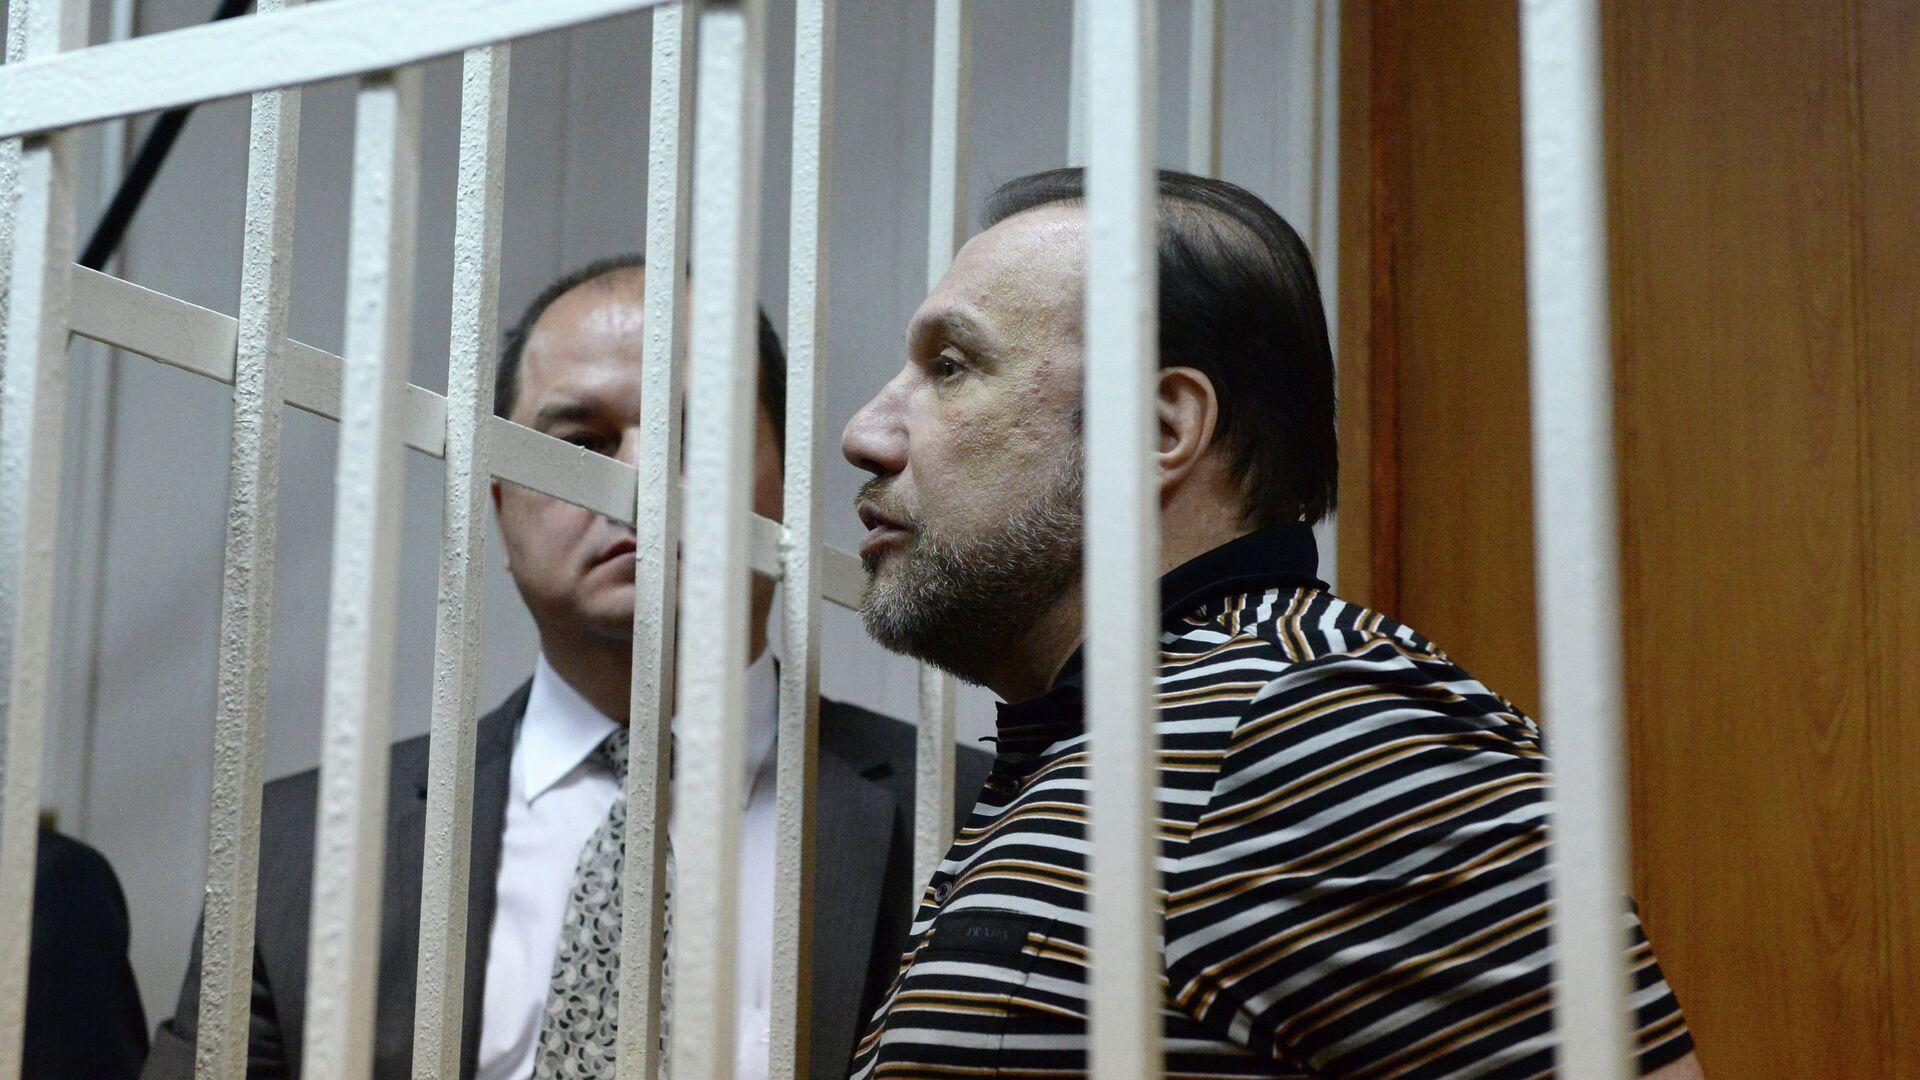 Виктора Батурина задержали по подозрению в покушении на мошенничество